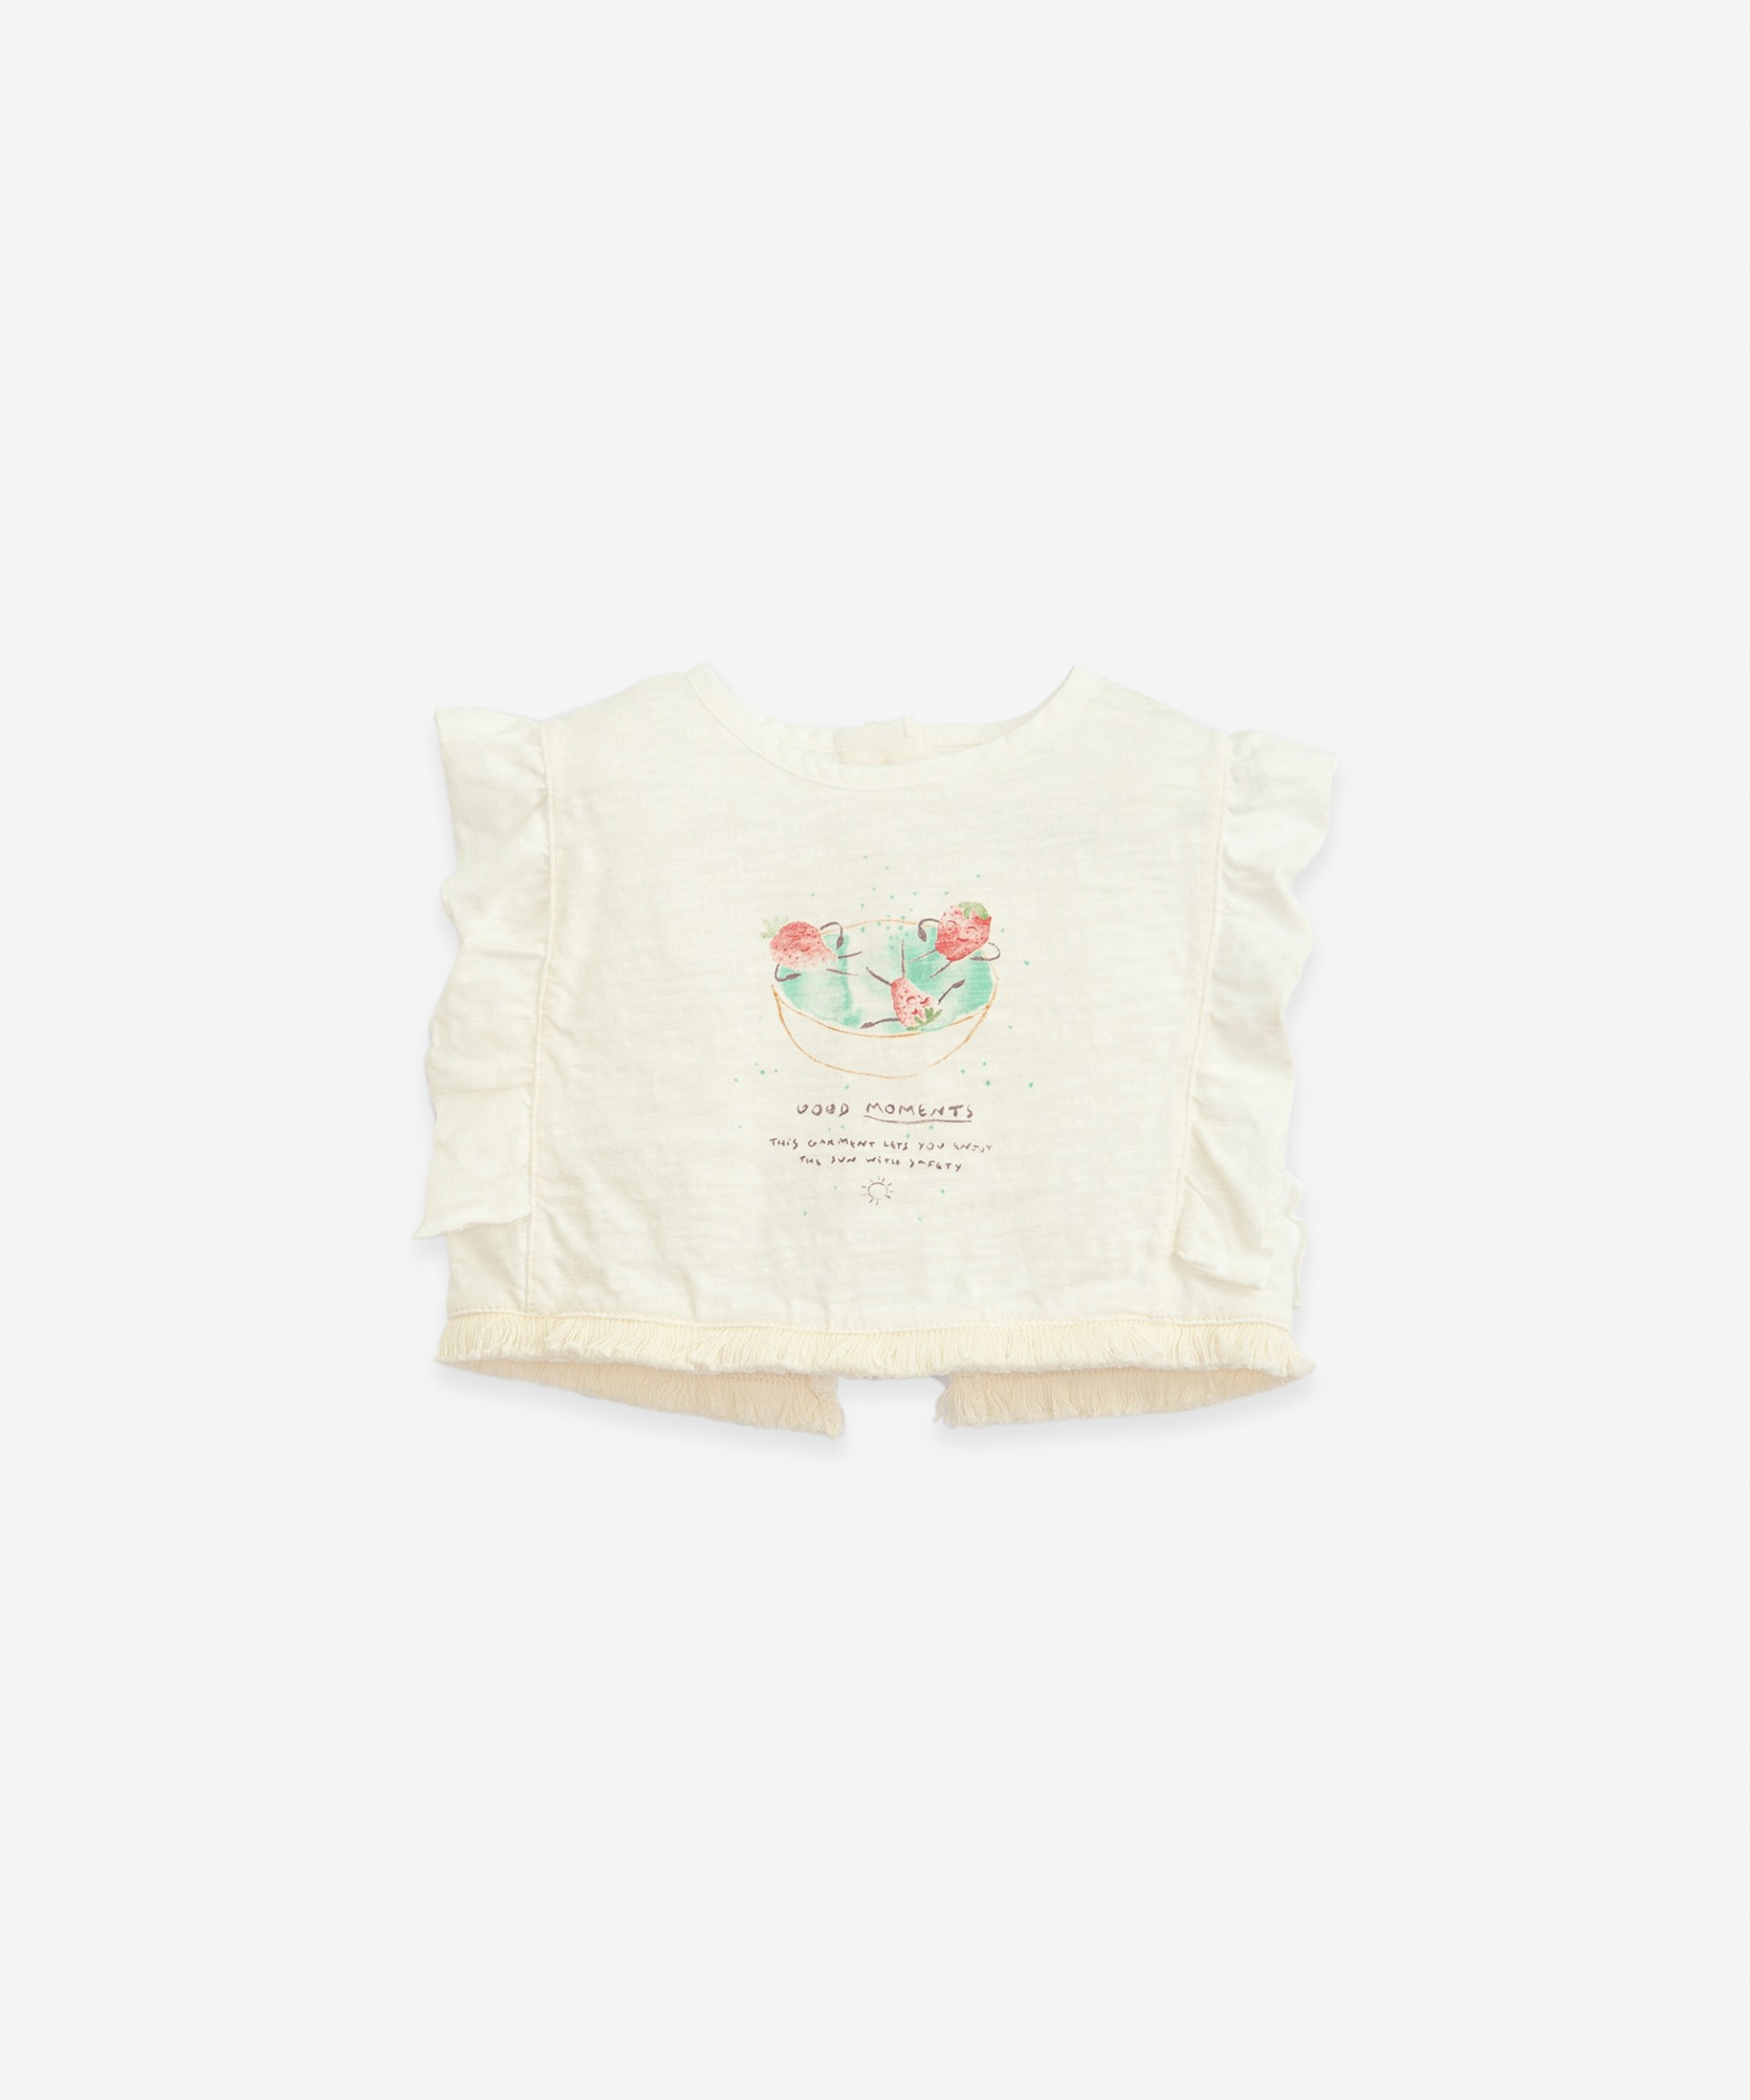 Anti-UV T-shirt in organic cotton | Botany